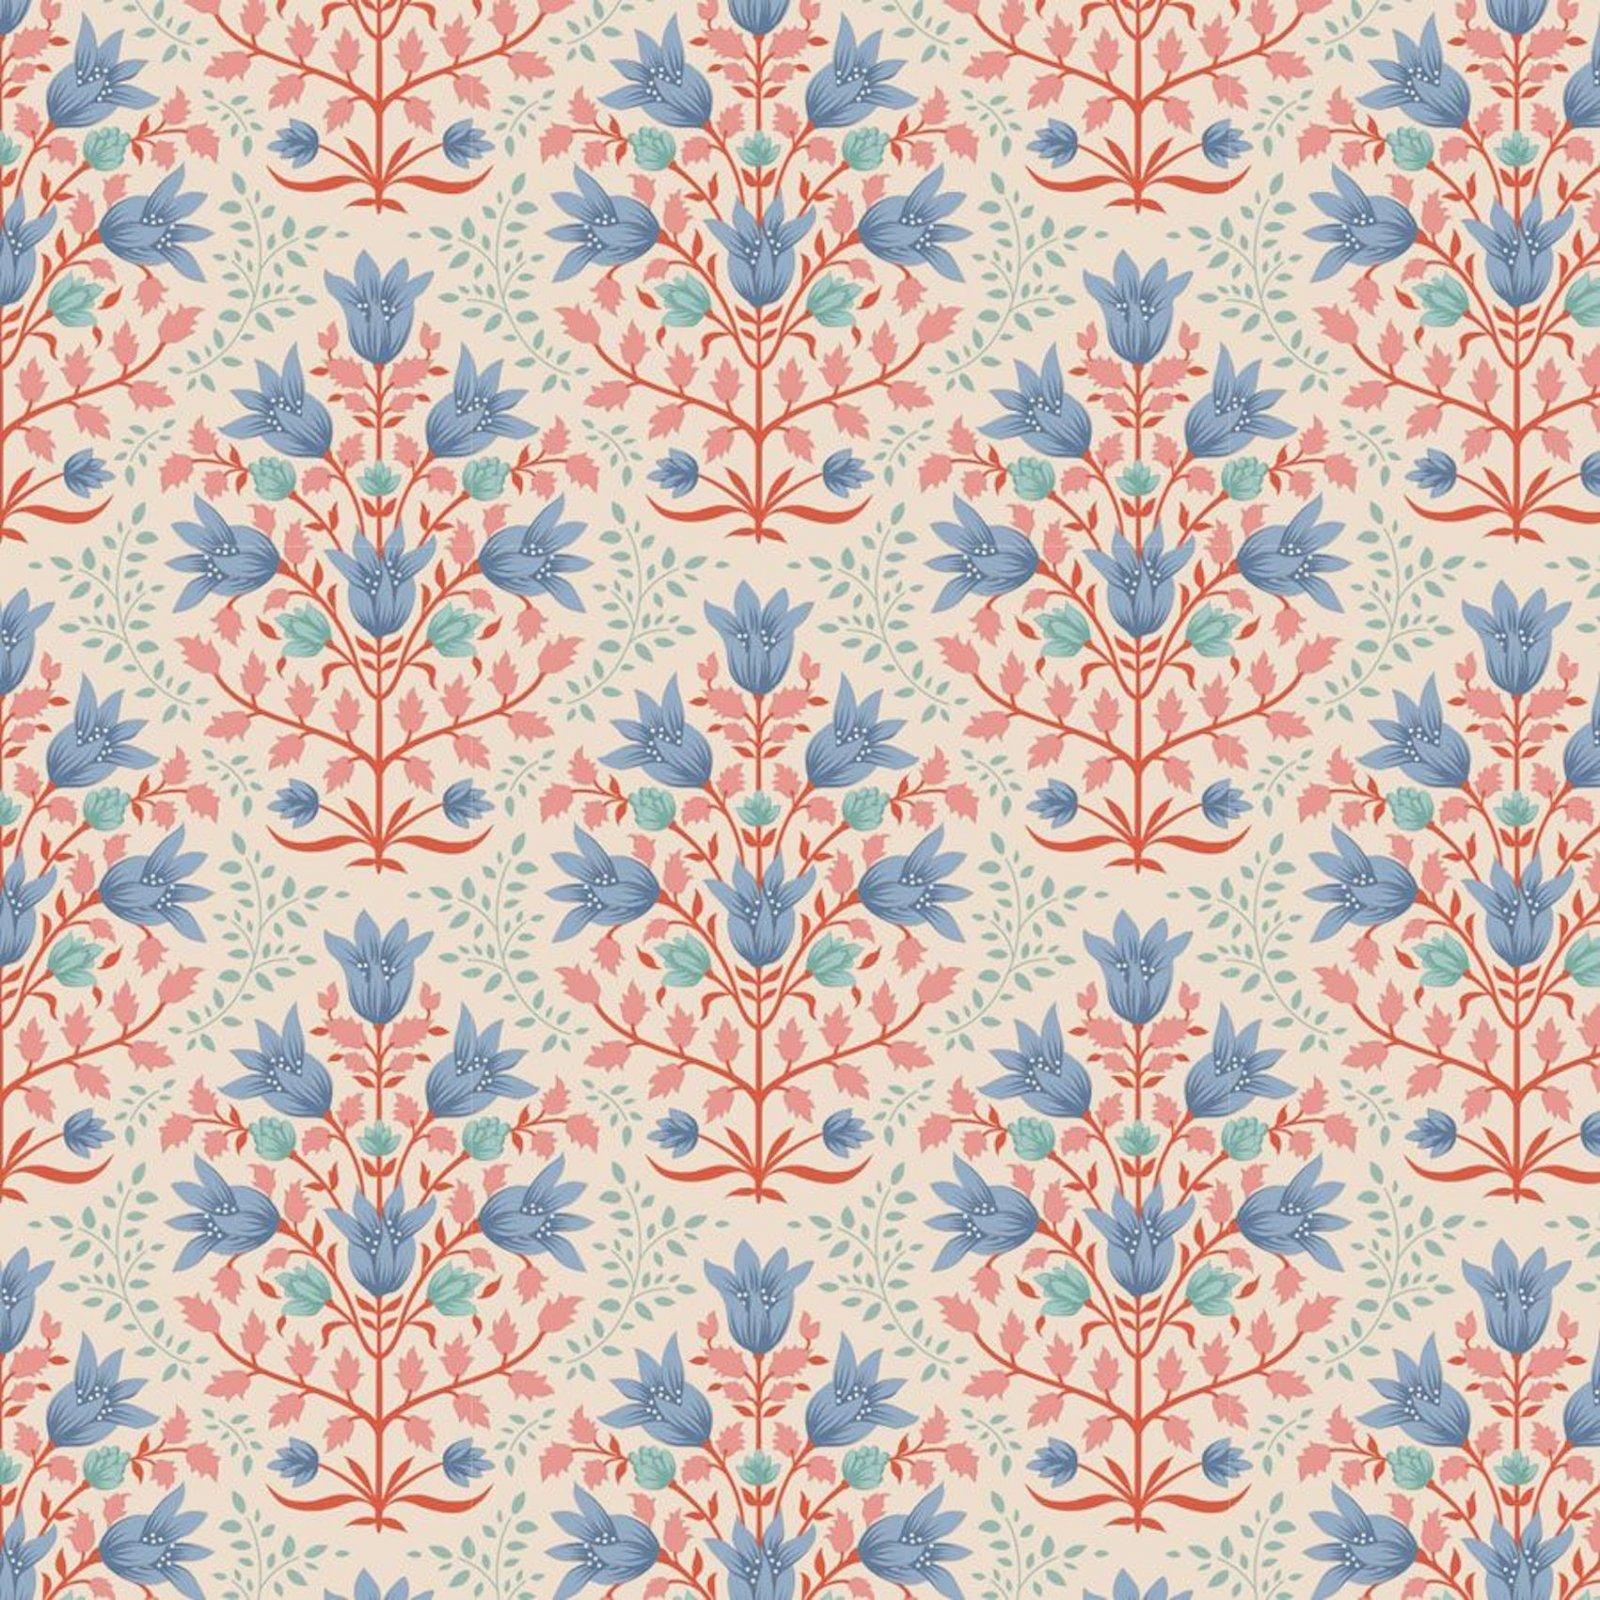 Tilda - Windy Days - Breeze Floral Blue